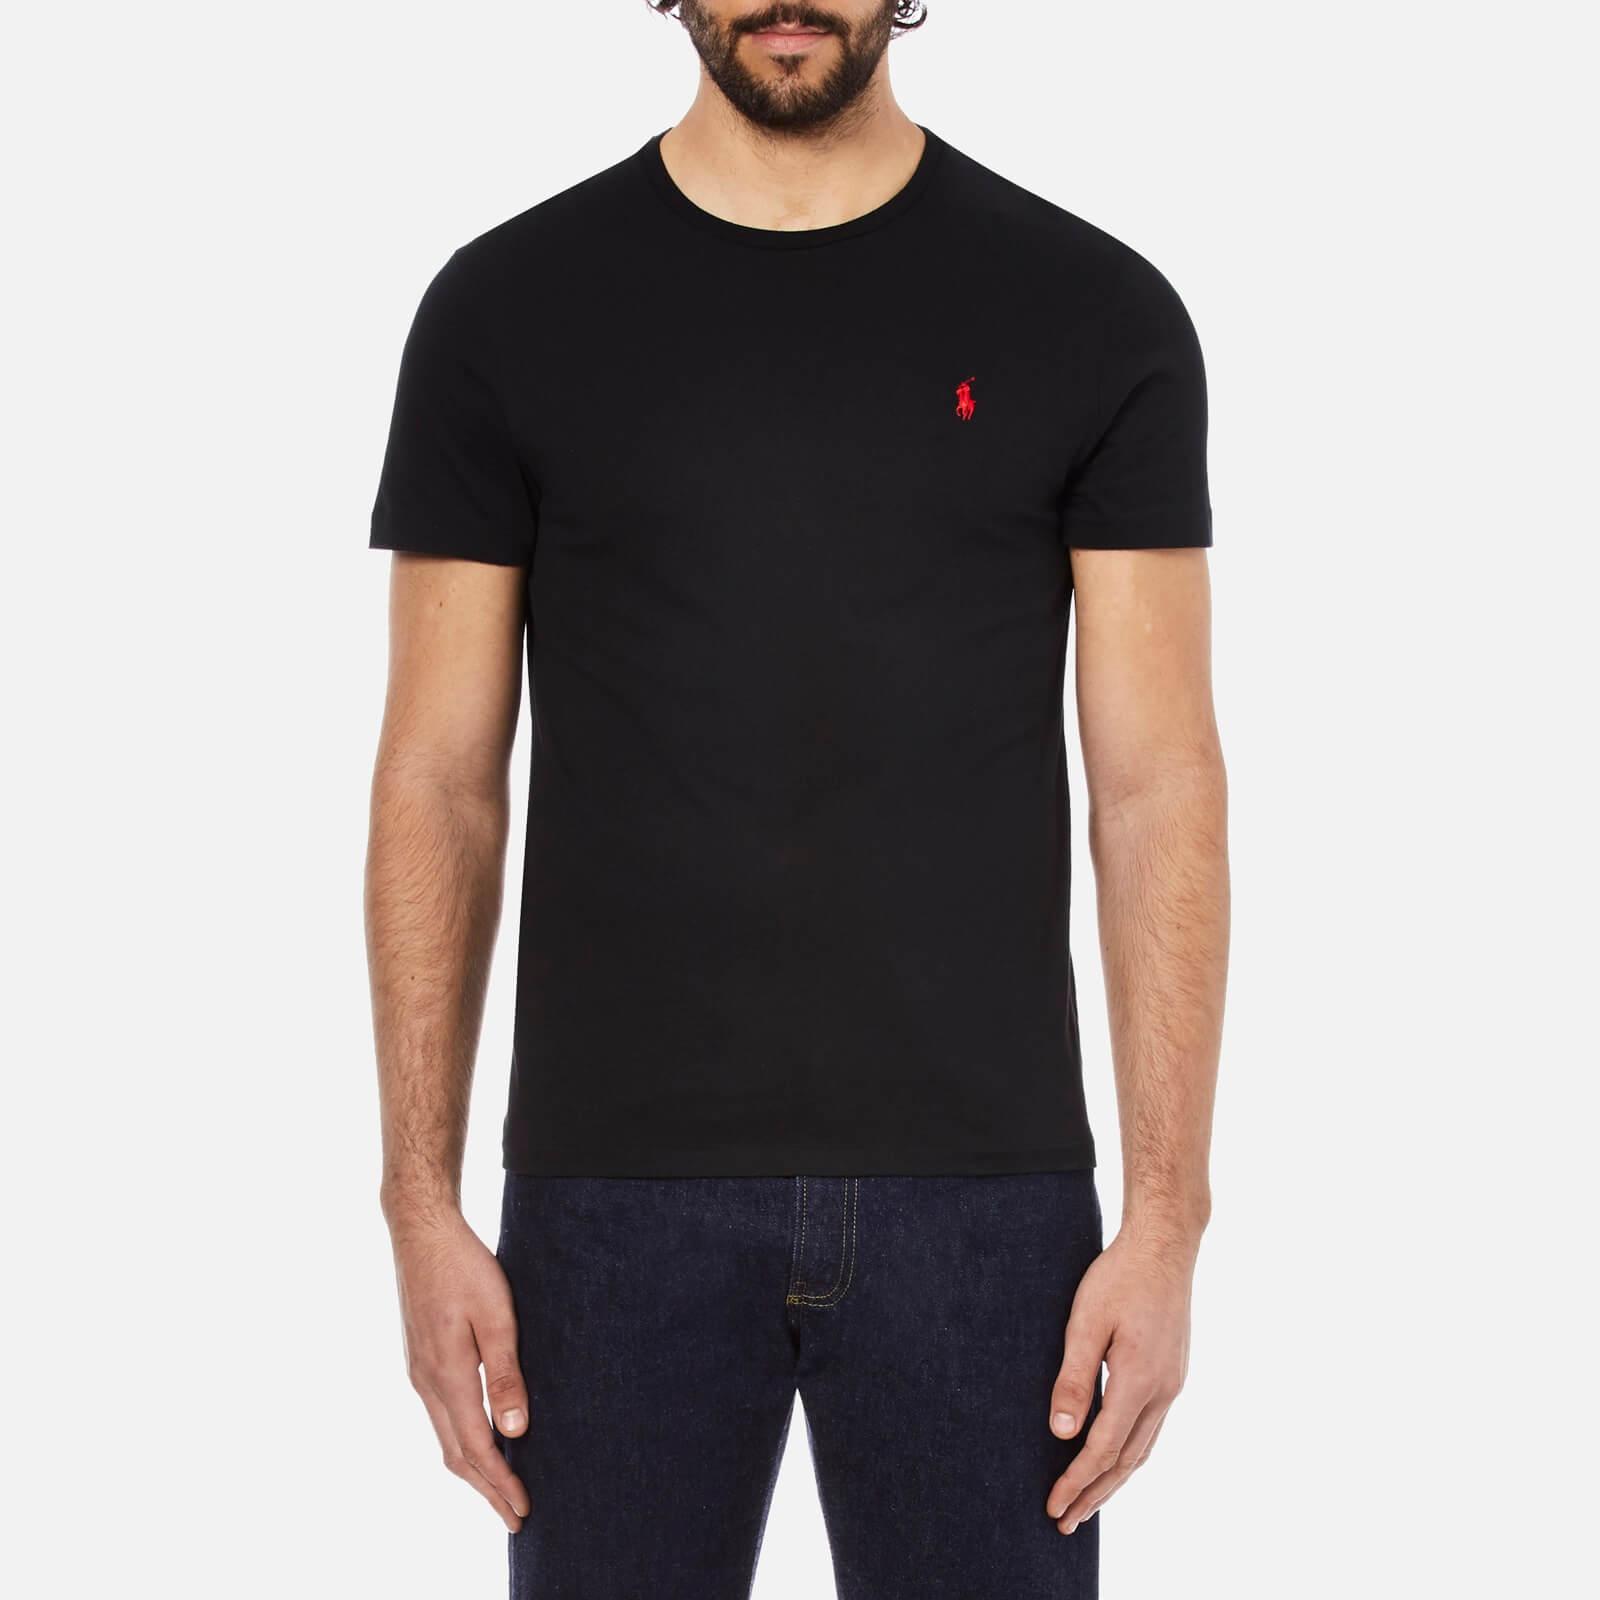 00220086 Polo Ralph Lauren Men's Short Sleeved Crew Neck T-Shirt - Rl Black - Free  UK Delivery over £50